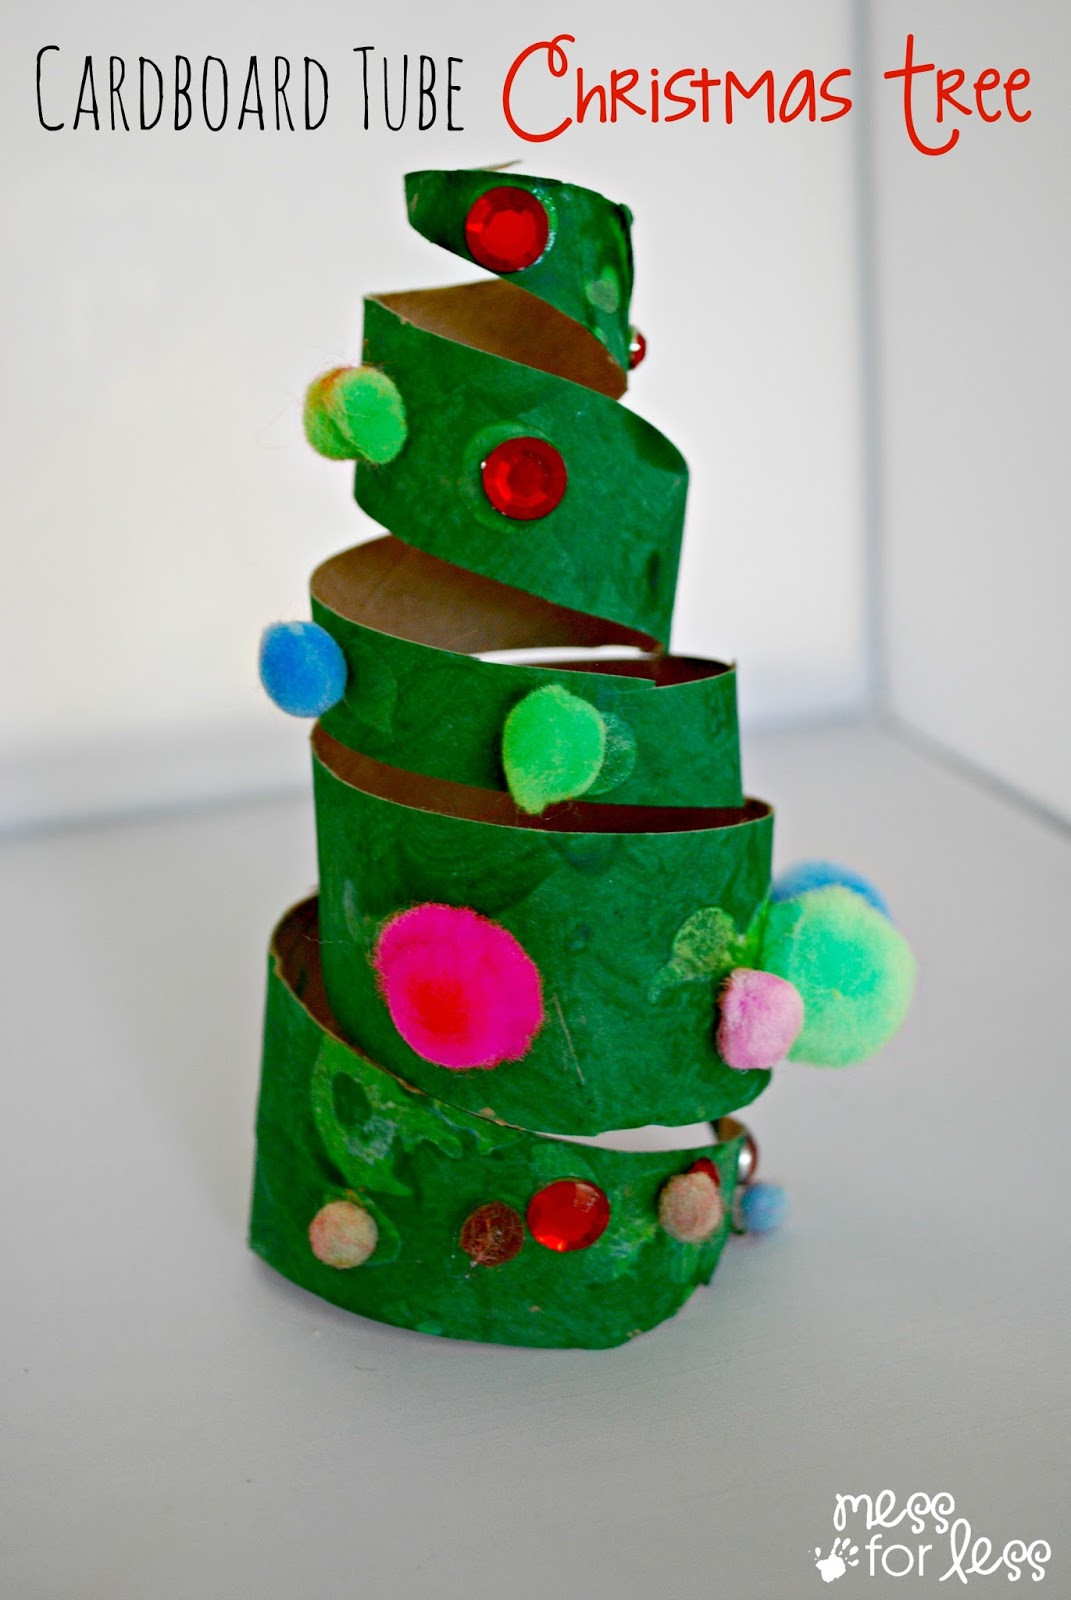 Christmas Craft Ideas For Preschoolers  Christmas Crafts for Kids Cardboard Tube Christmas Tree